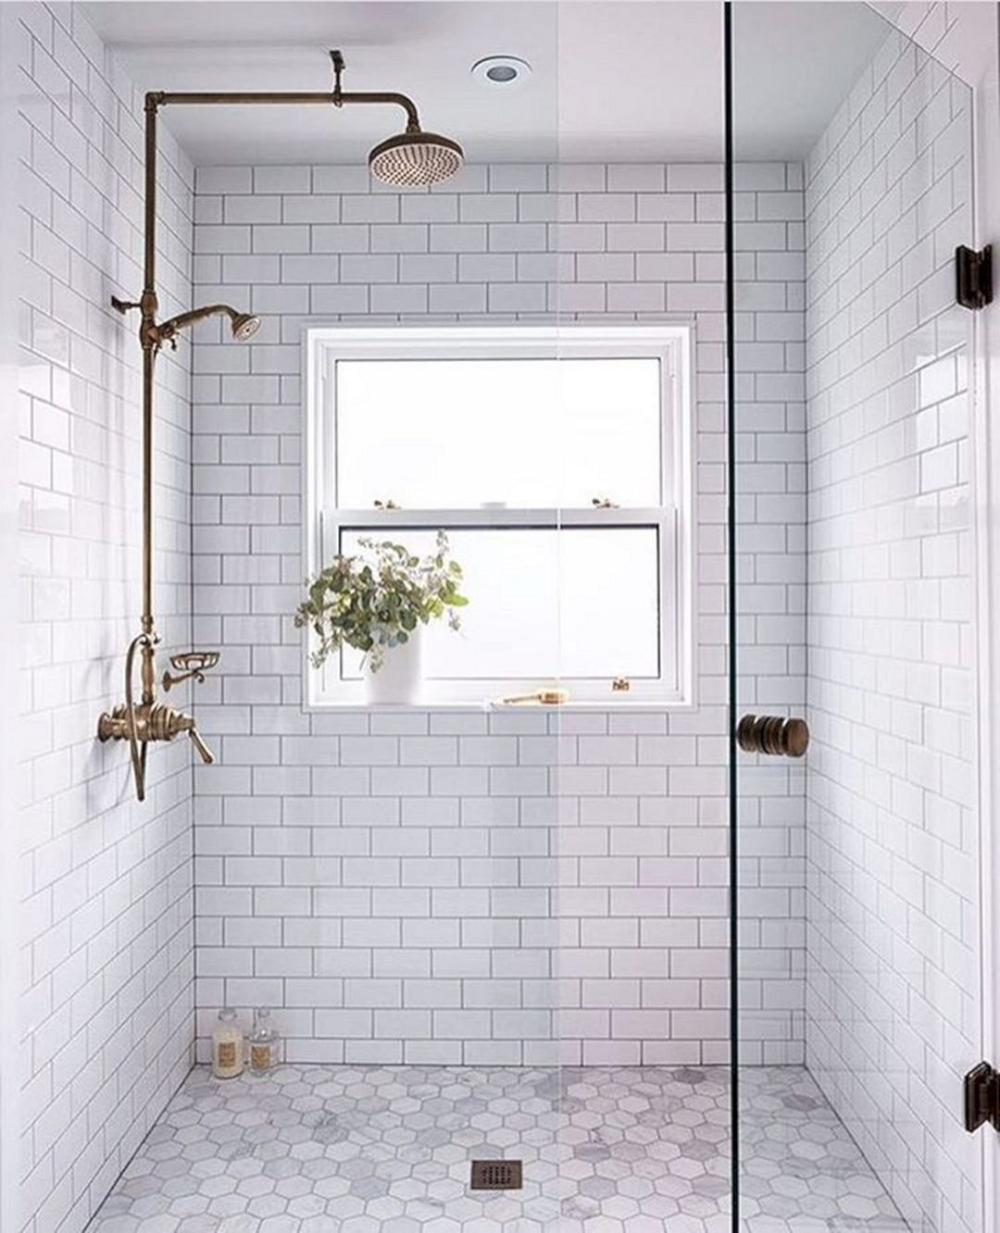 white subway tile bathroom 033 white subway tile bathroom on bathroom renovation ideas white id=98998